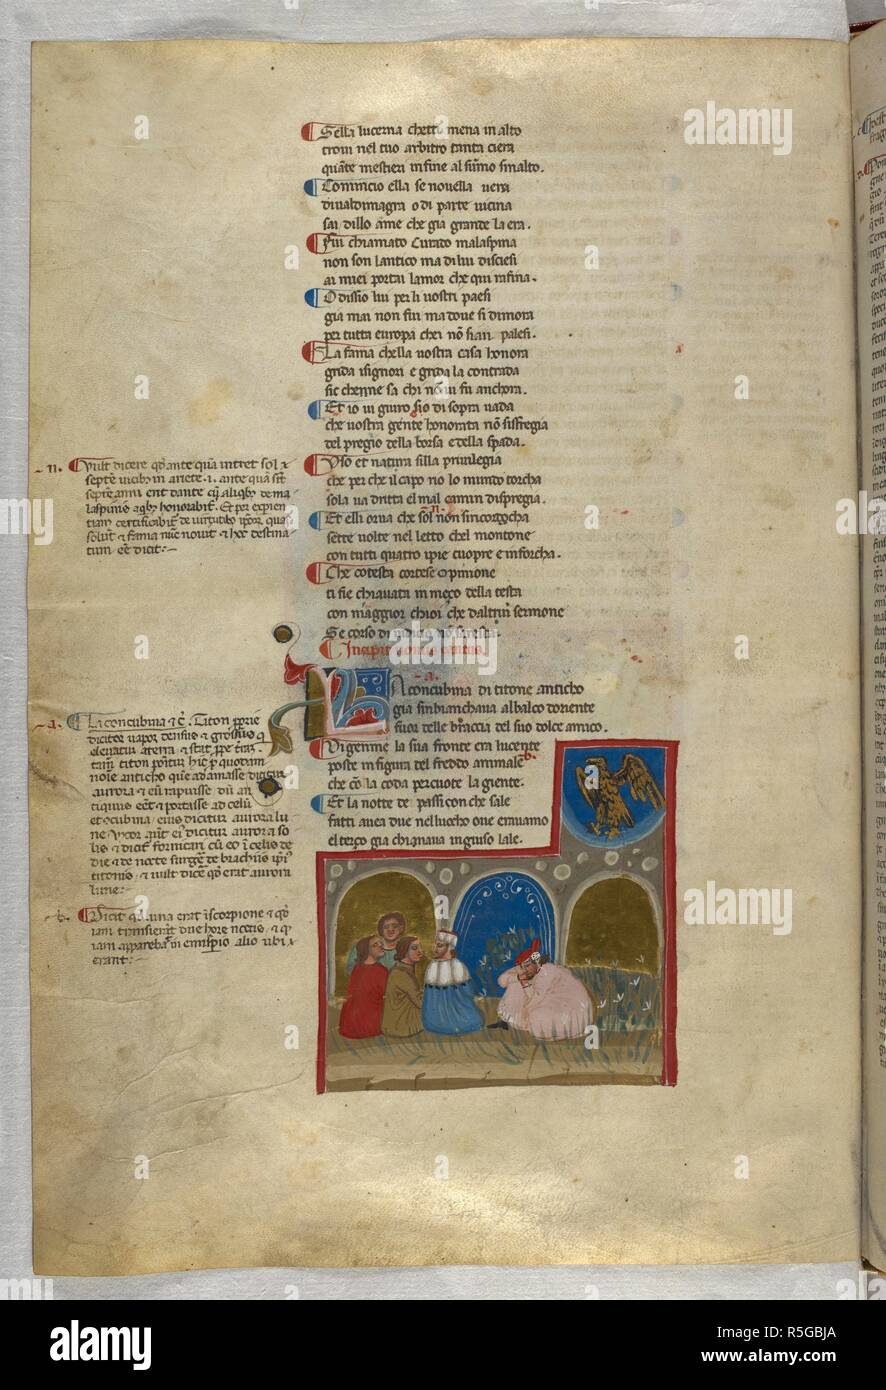 Purgatorio: Dante dreams of an eagle above him. Dante Alighieri, Divina Commedia ( The Divine Comedy ), with a commentary in Latin. 1st half of the 14th century. Source: Egerton 943, f.77v. Language: Italian, Latin. - Stock Image